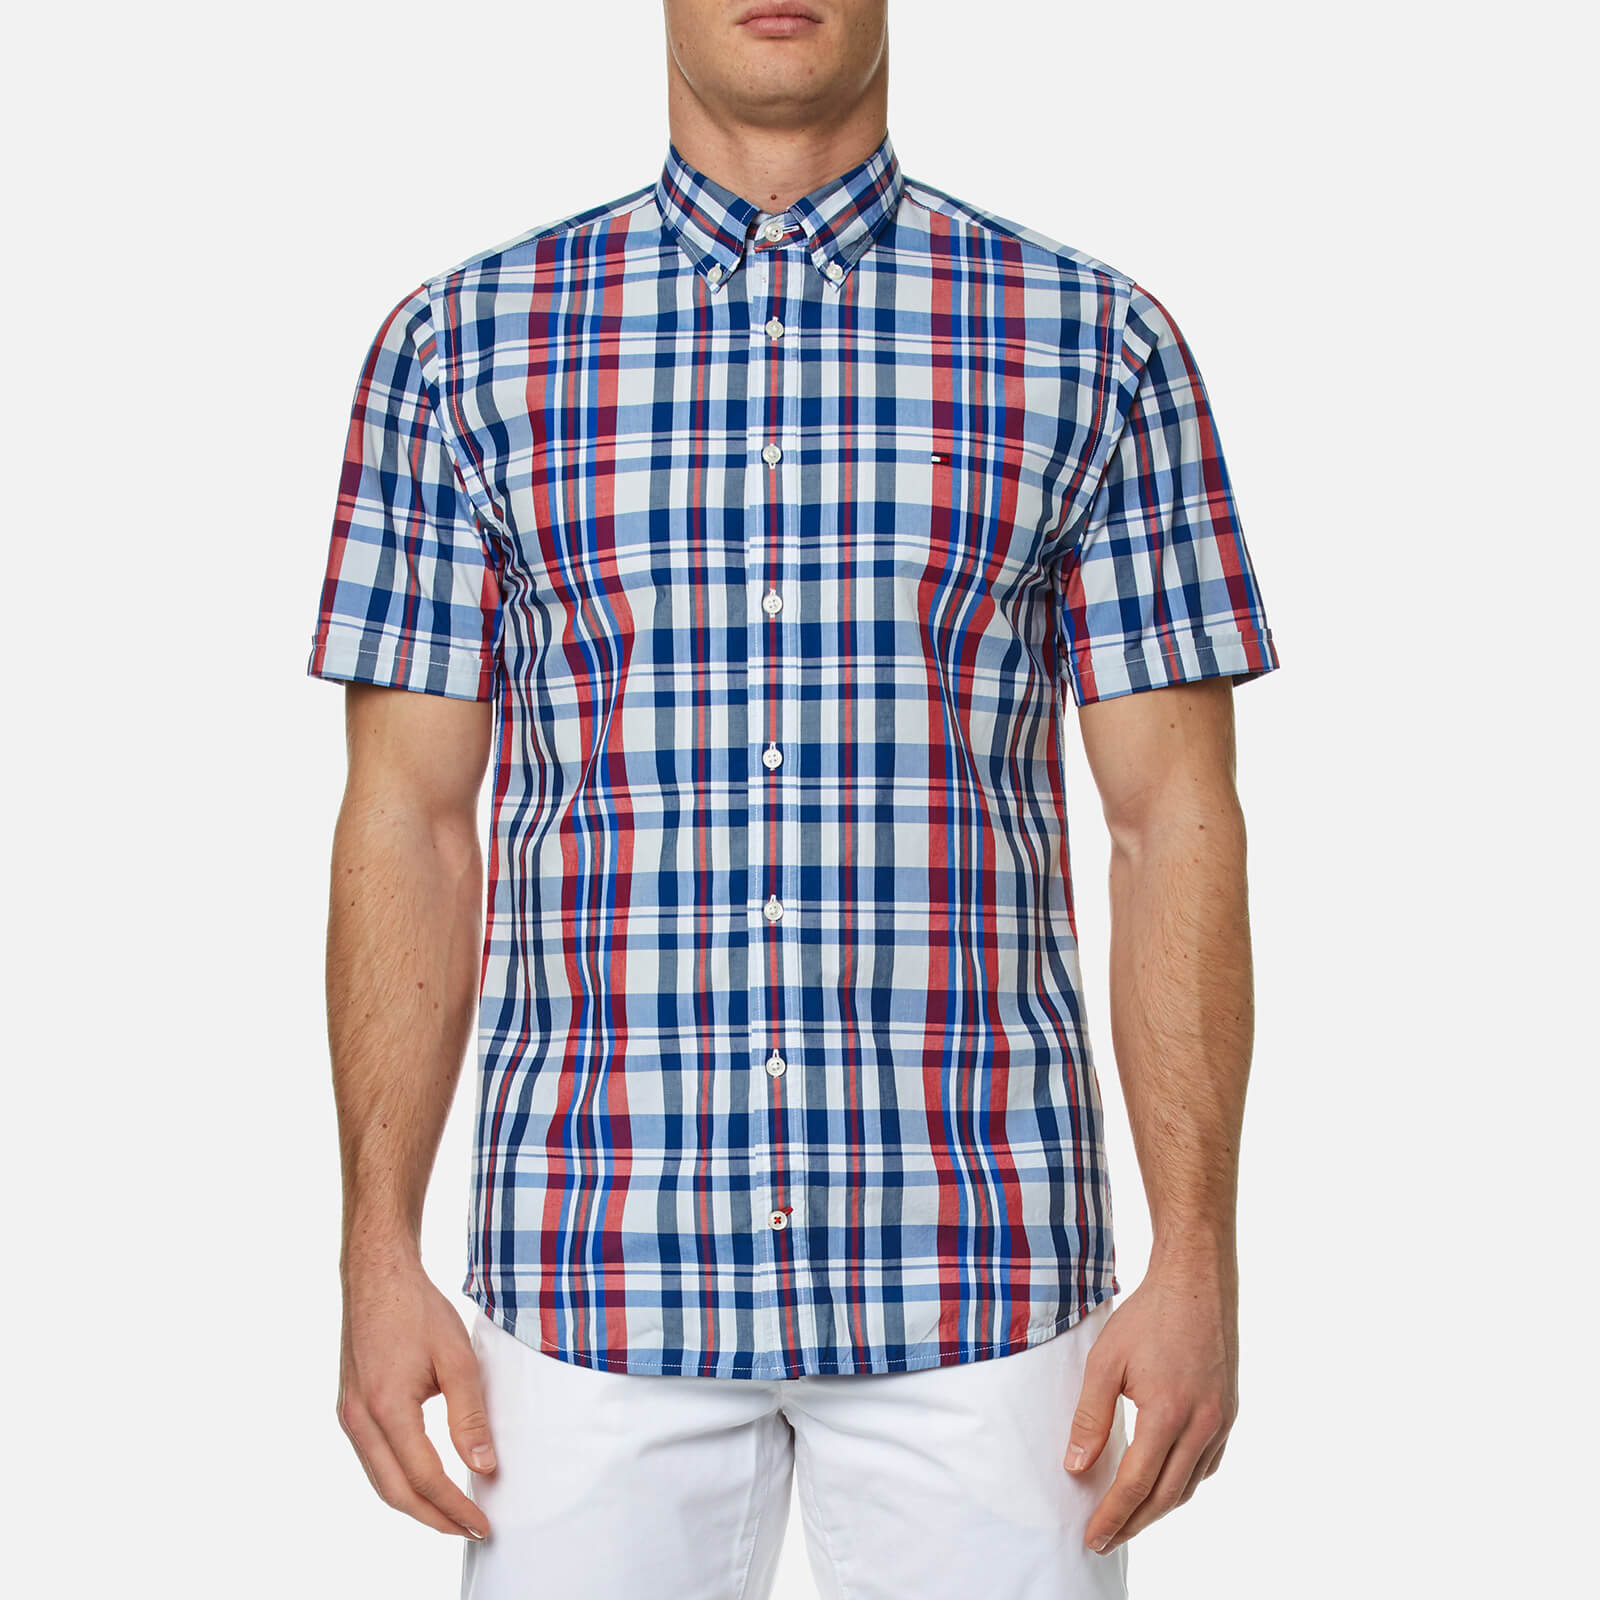 bc61c4b3 Tommy Hilfiger Men's Lester Check Short Sleeve Shirt - Blue/Apple Red -  Free UK Delivery over £50